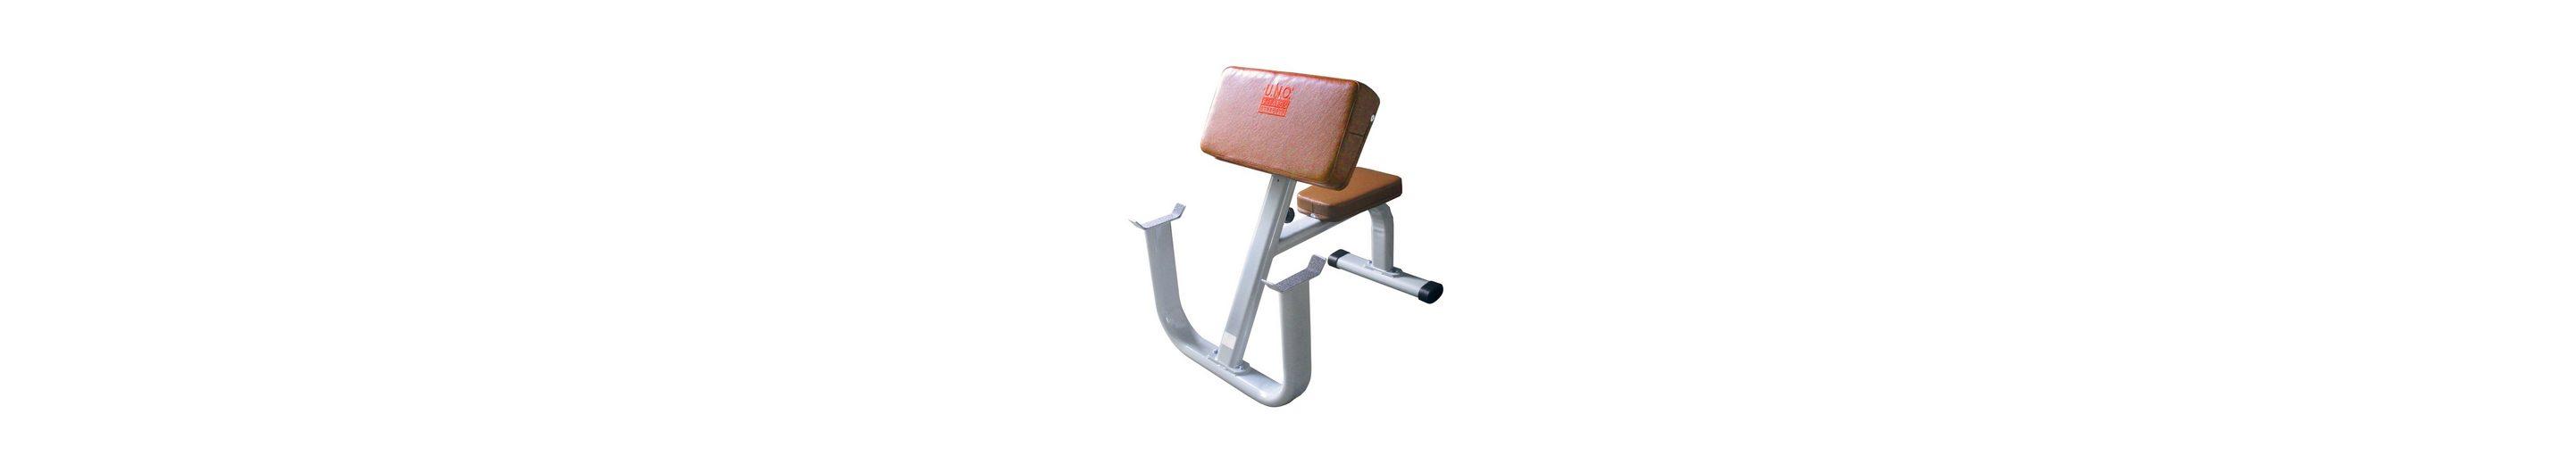 Curl Bank, »STR1700«, Strength by U.N.O. Fitness